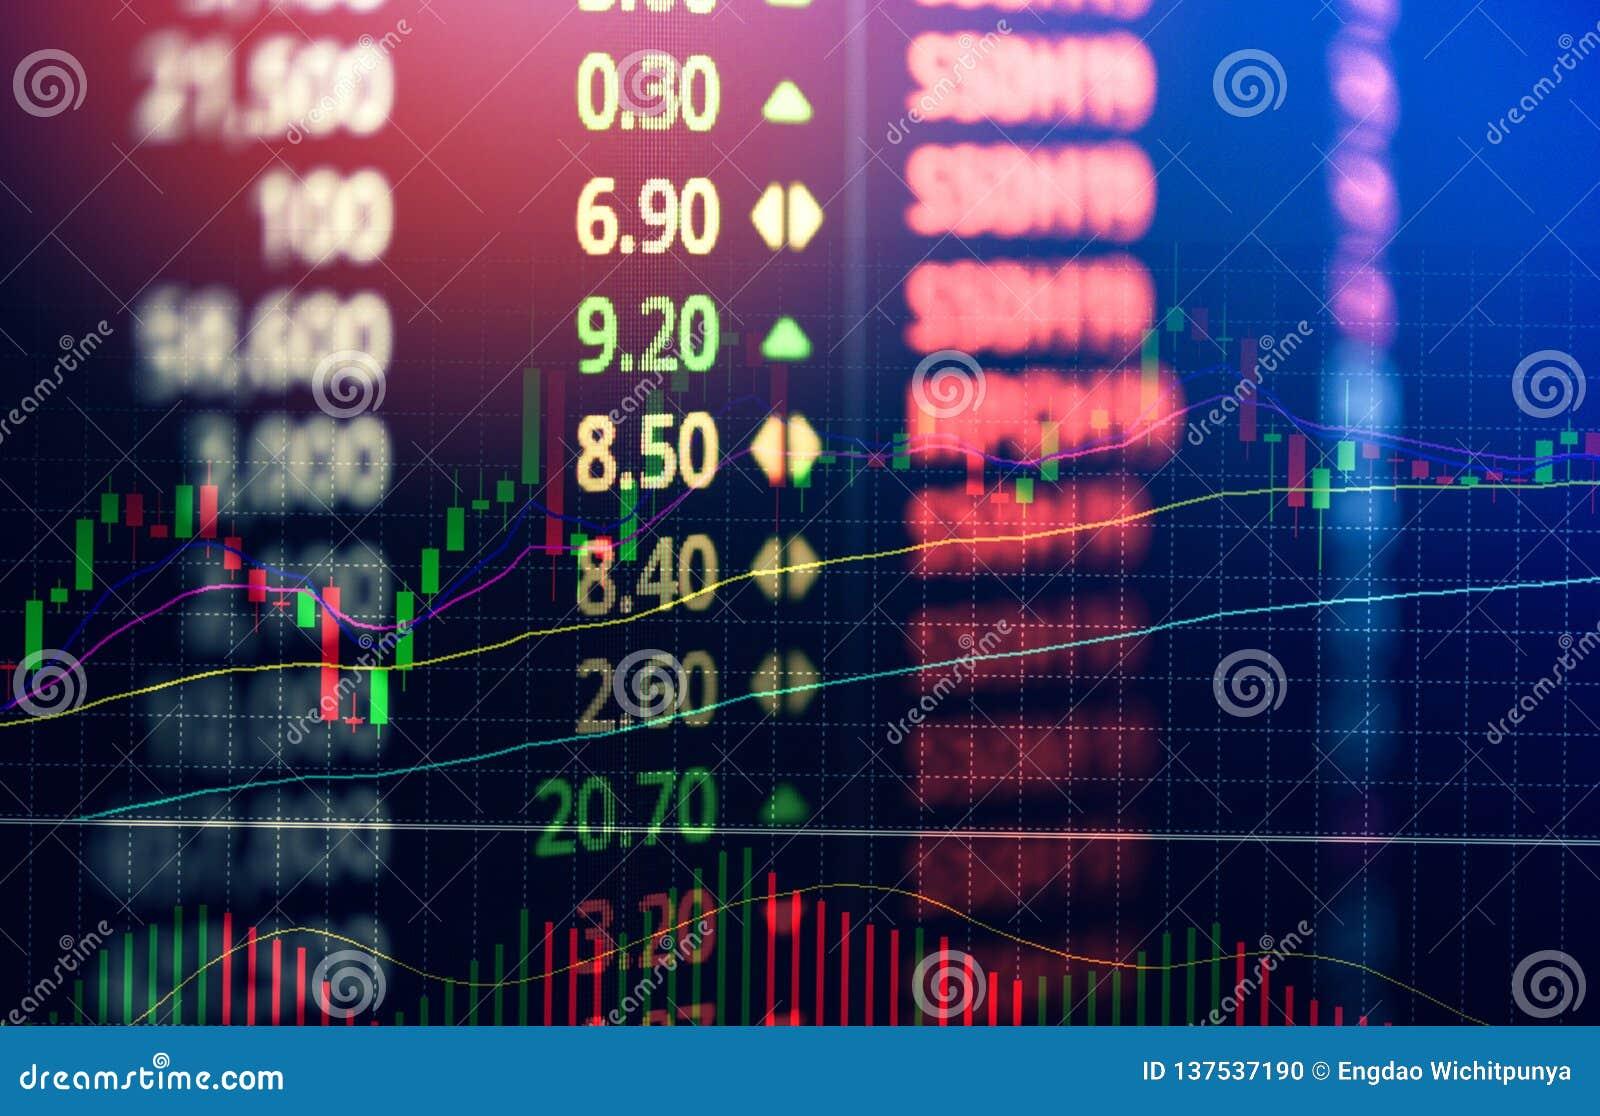 Volume candlestick graph Stock market exchange analysis / indicator Trading graph